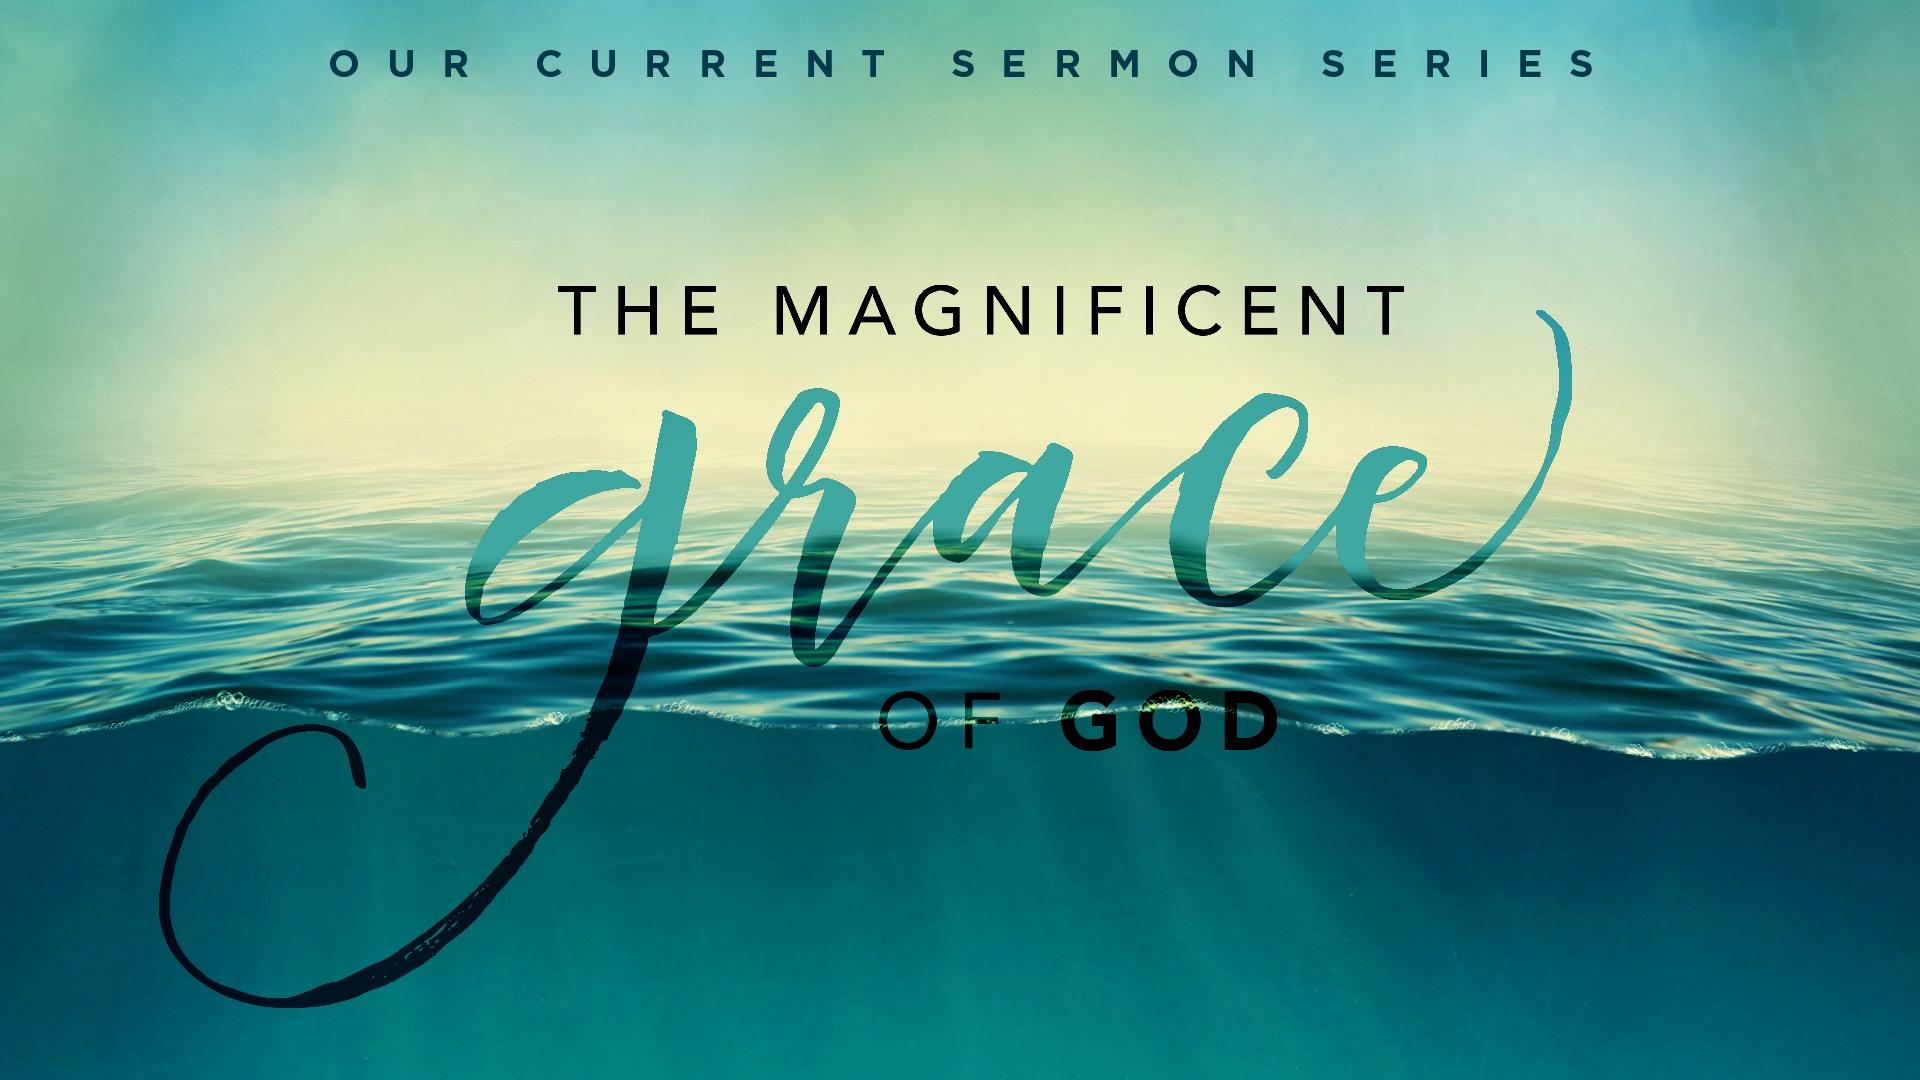 Magnificent Grace of God